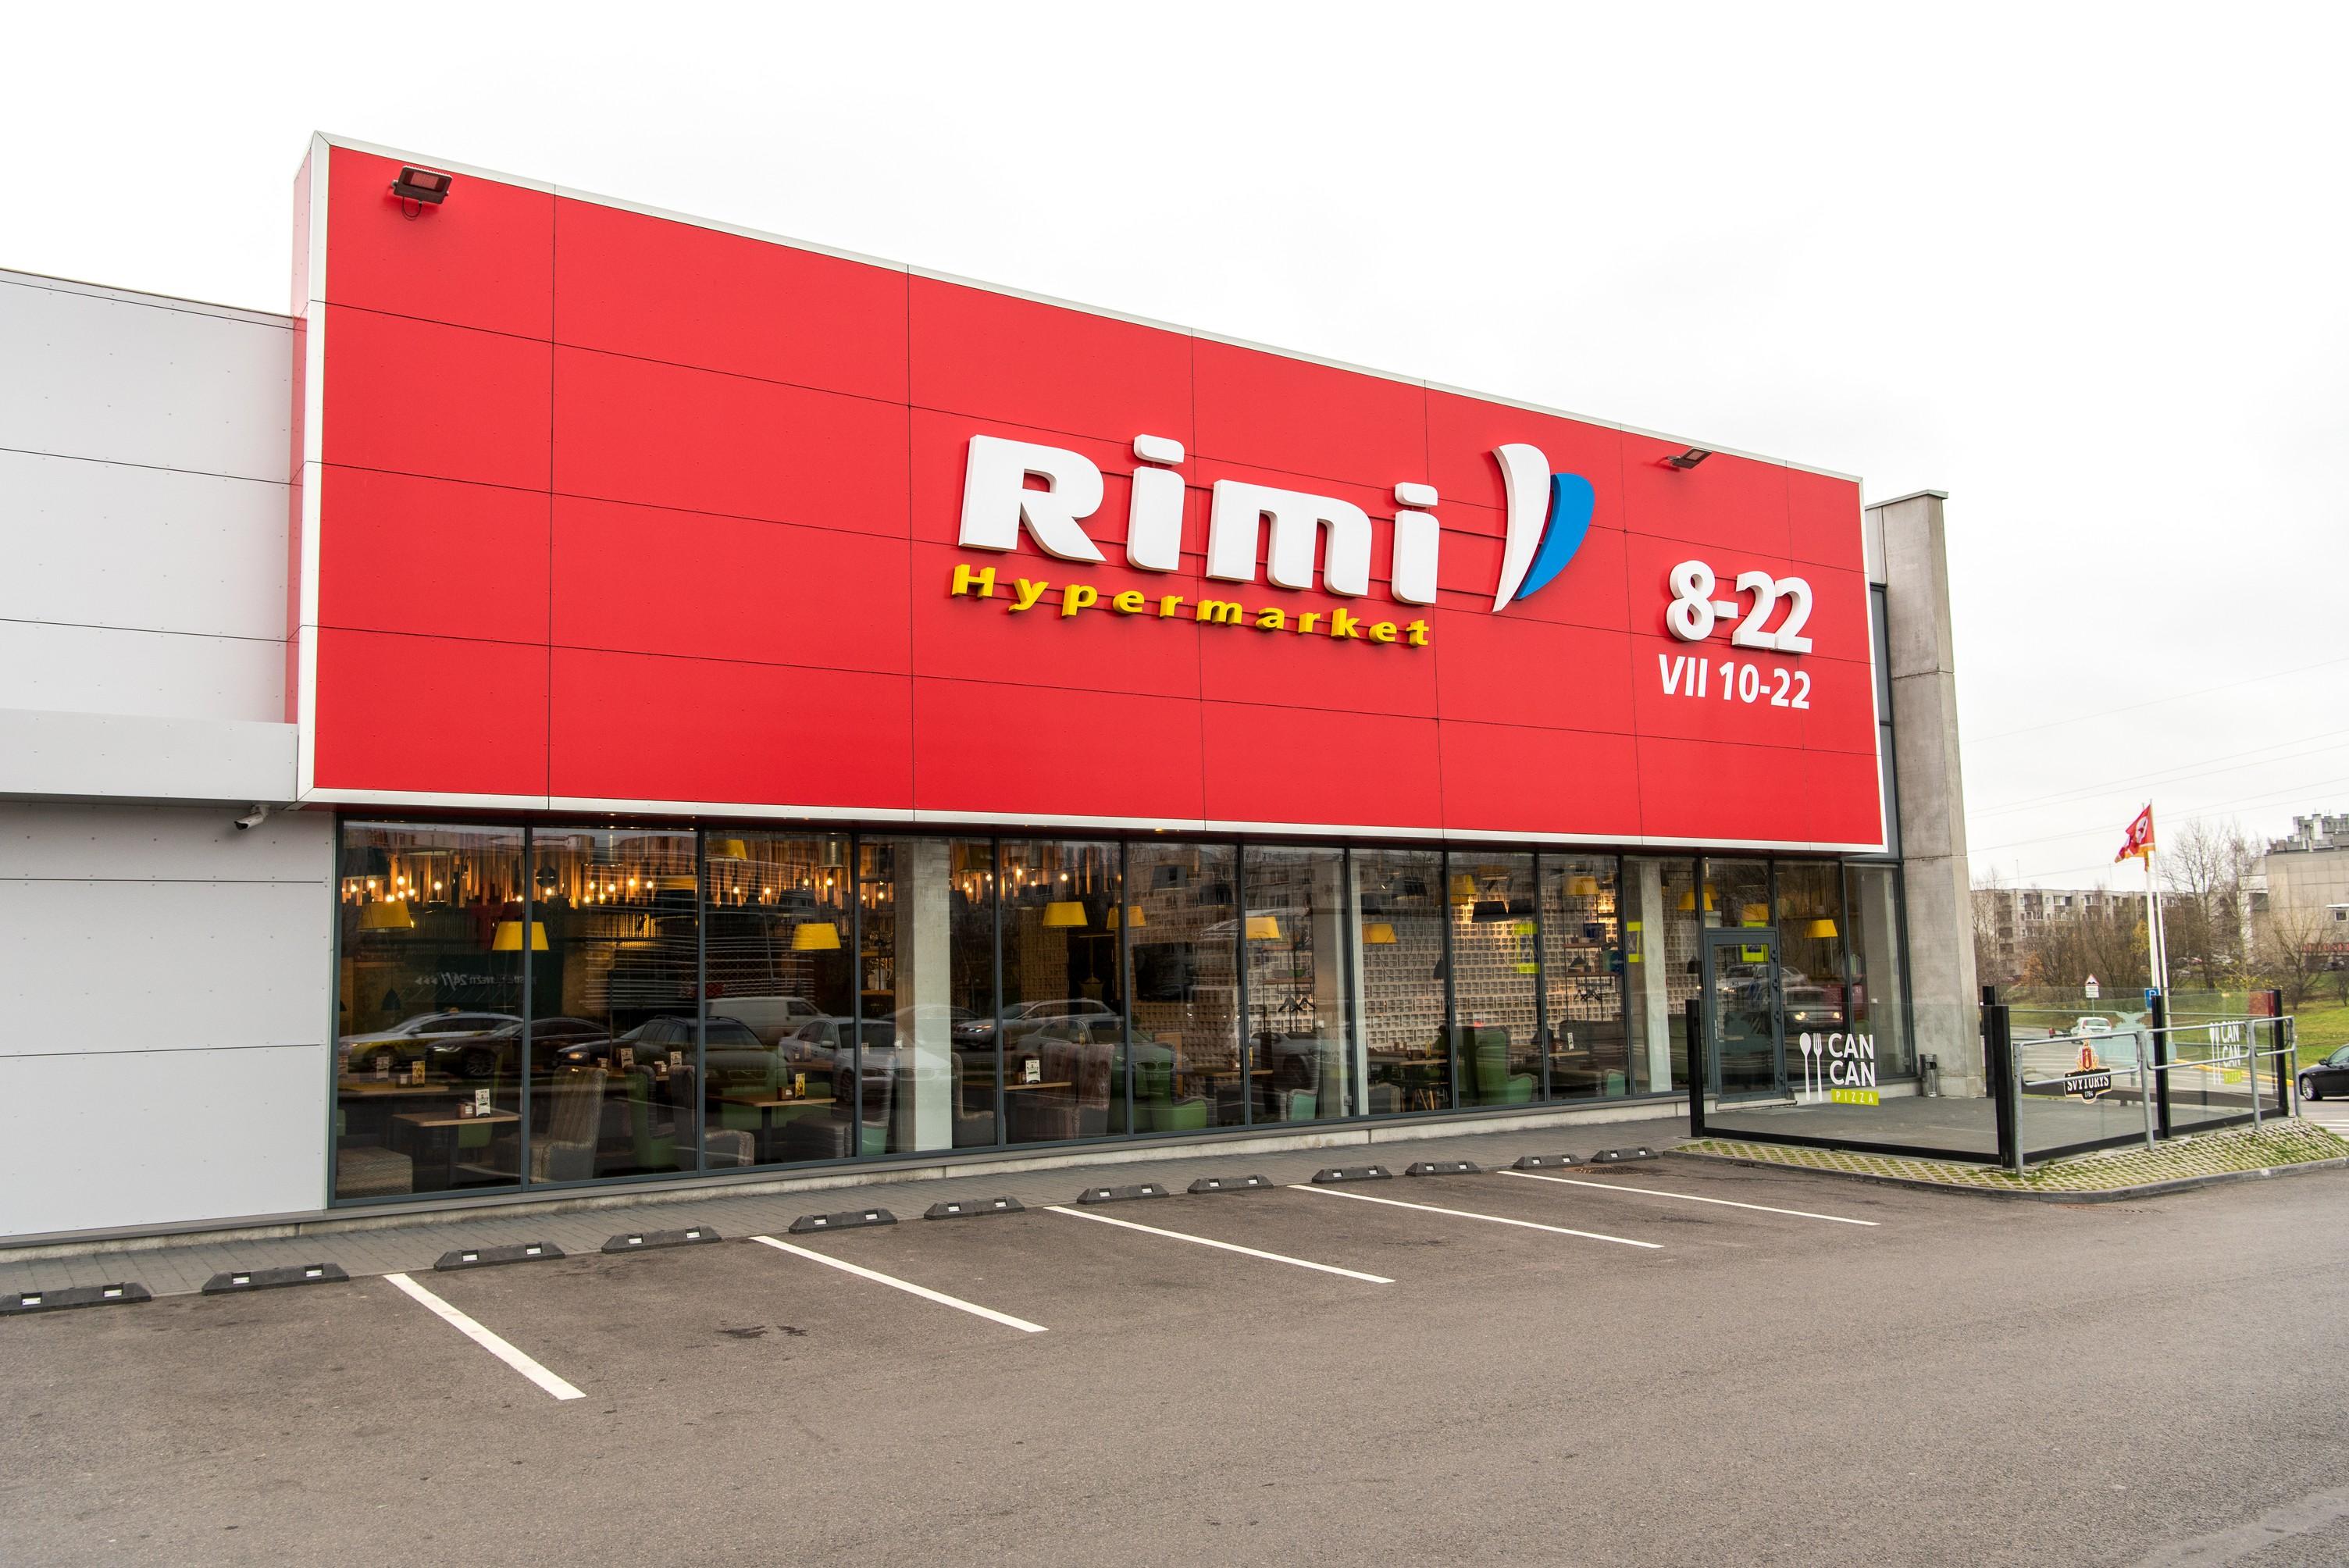 Rimi shop in Vilnius (Ukmergės street)